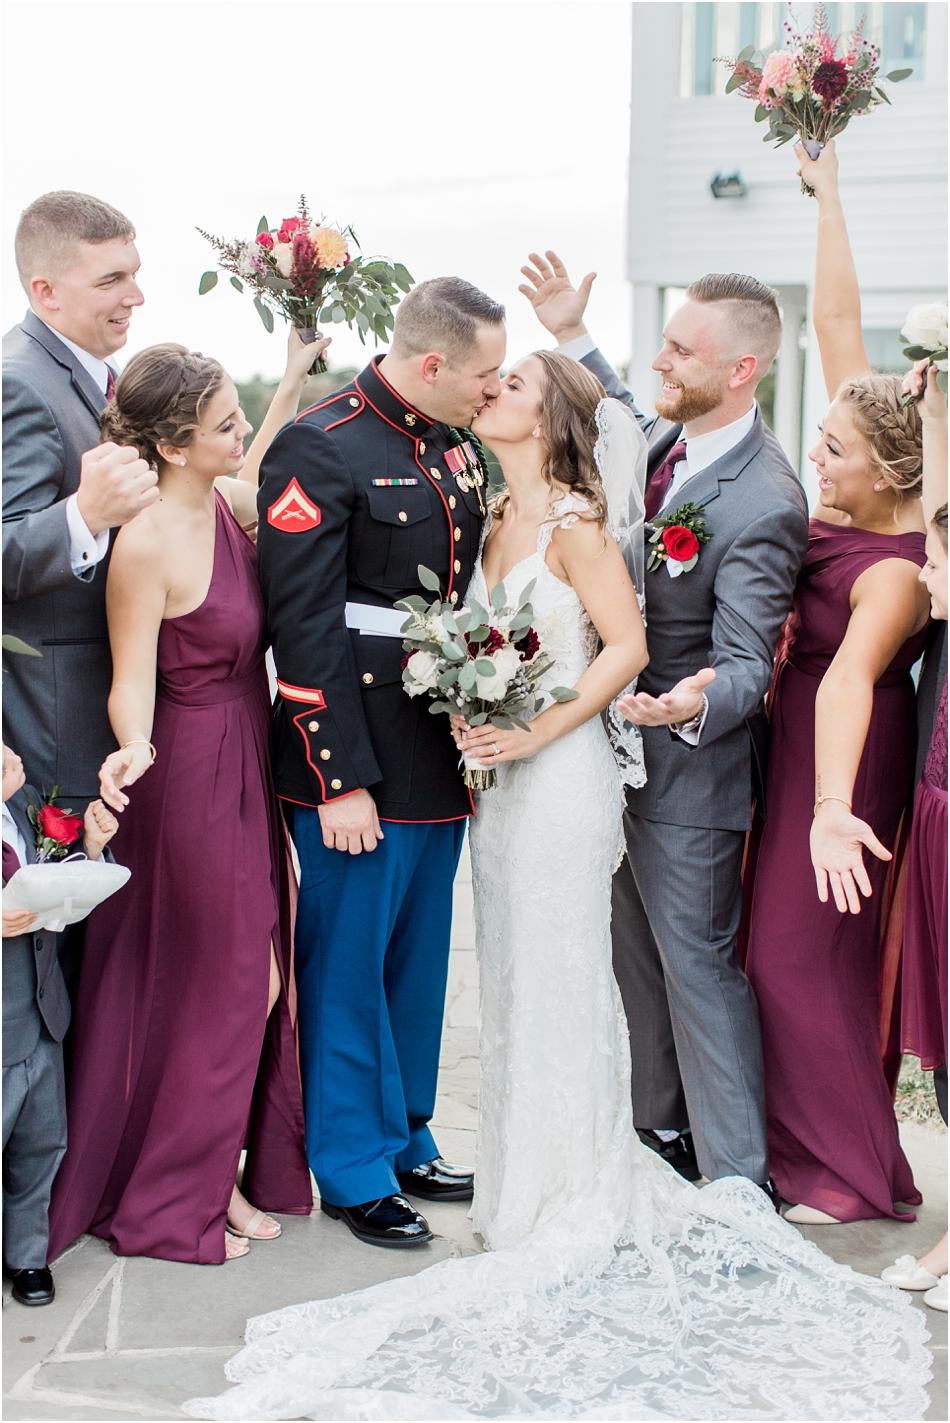 south_shore_country_club_hingham_amanda_chris_cape_cod_boston_new_england_wedding_photographer_Meredith_Jane_Photography_photo_2717.jpg